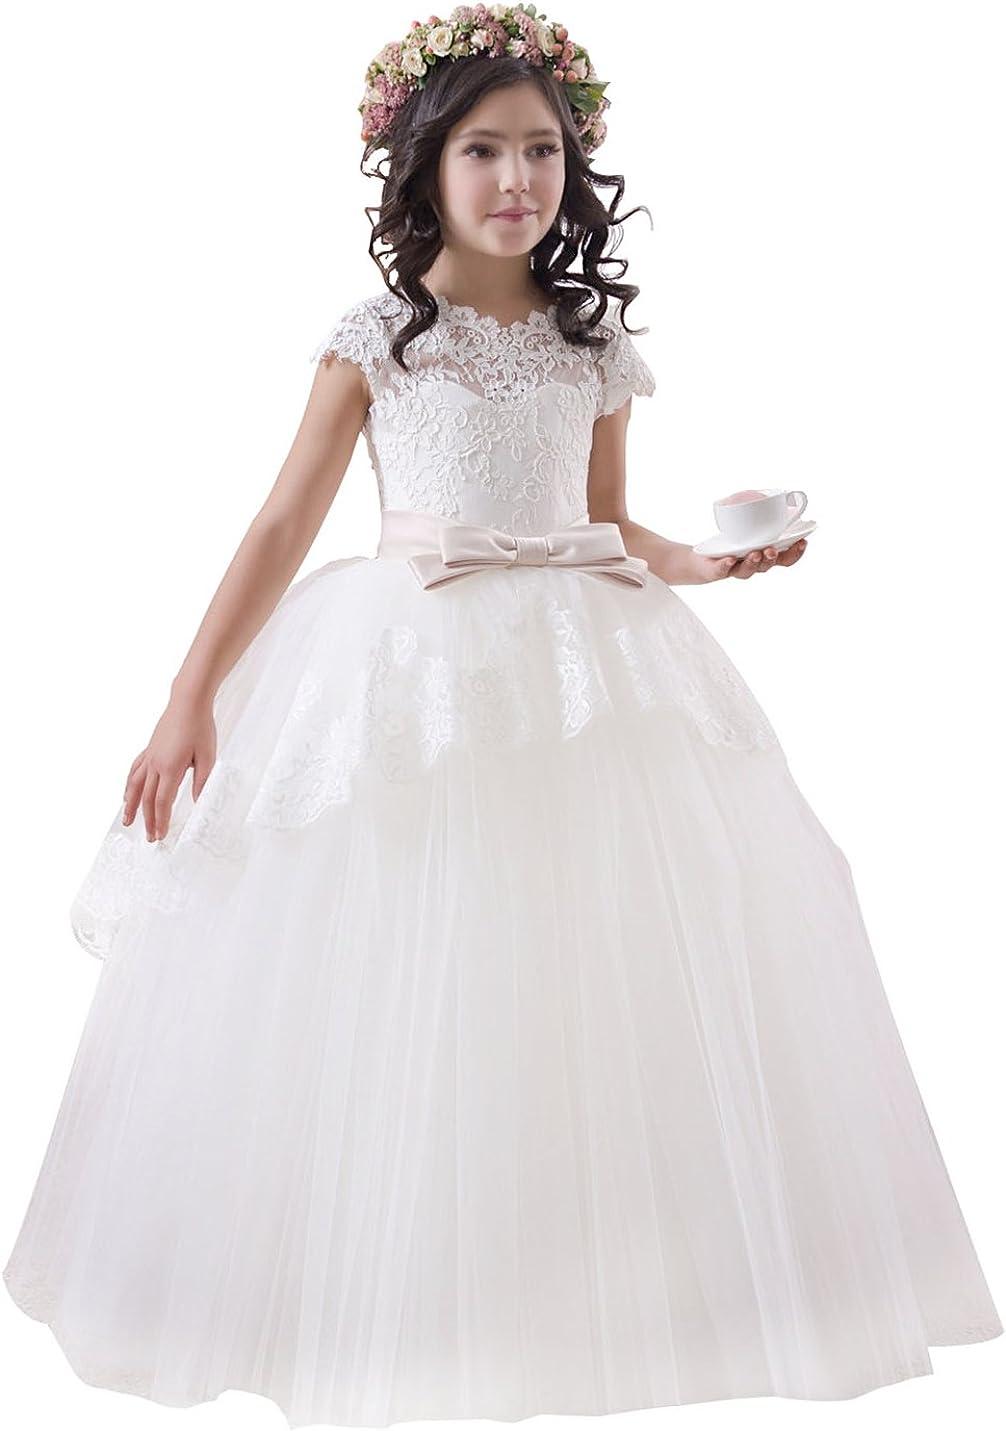 princhar Tulle Floor Length Flower Girl Dress Party Ball Gown Holiday Dress